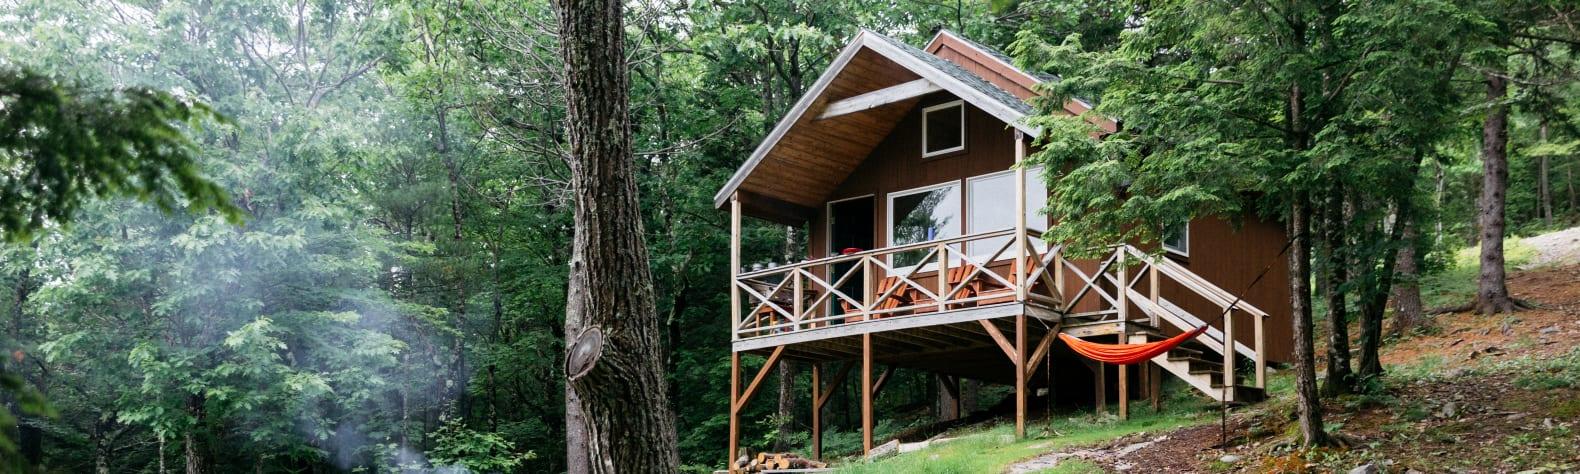 Tuckermans Cabin on Pleasant Mt